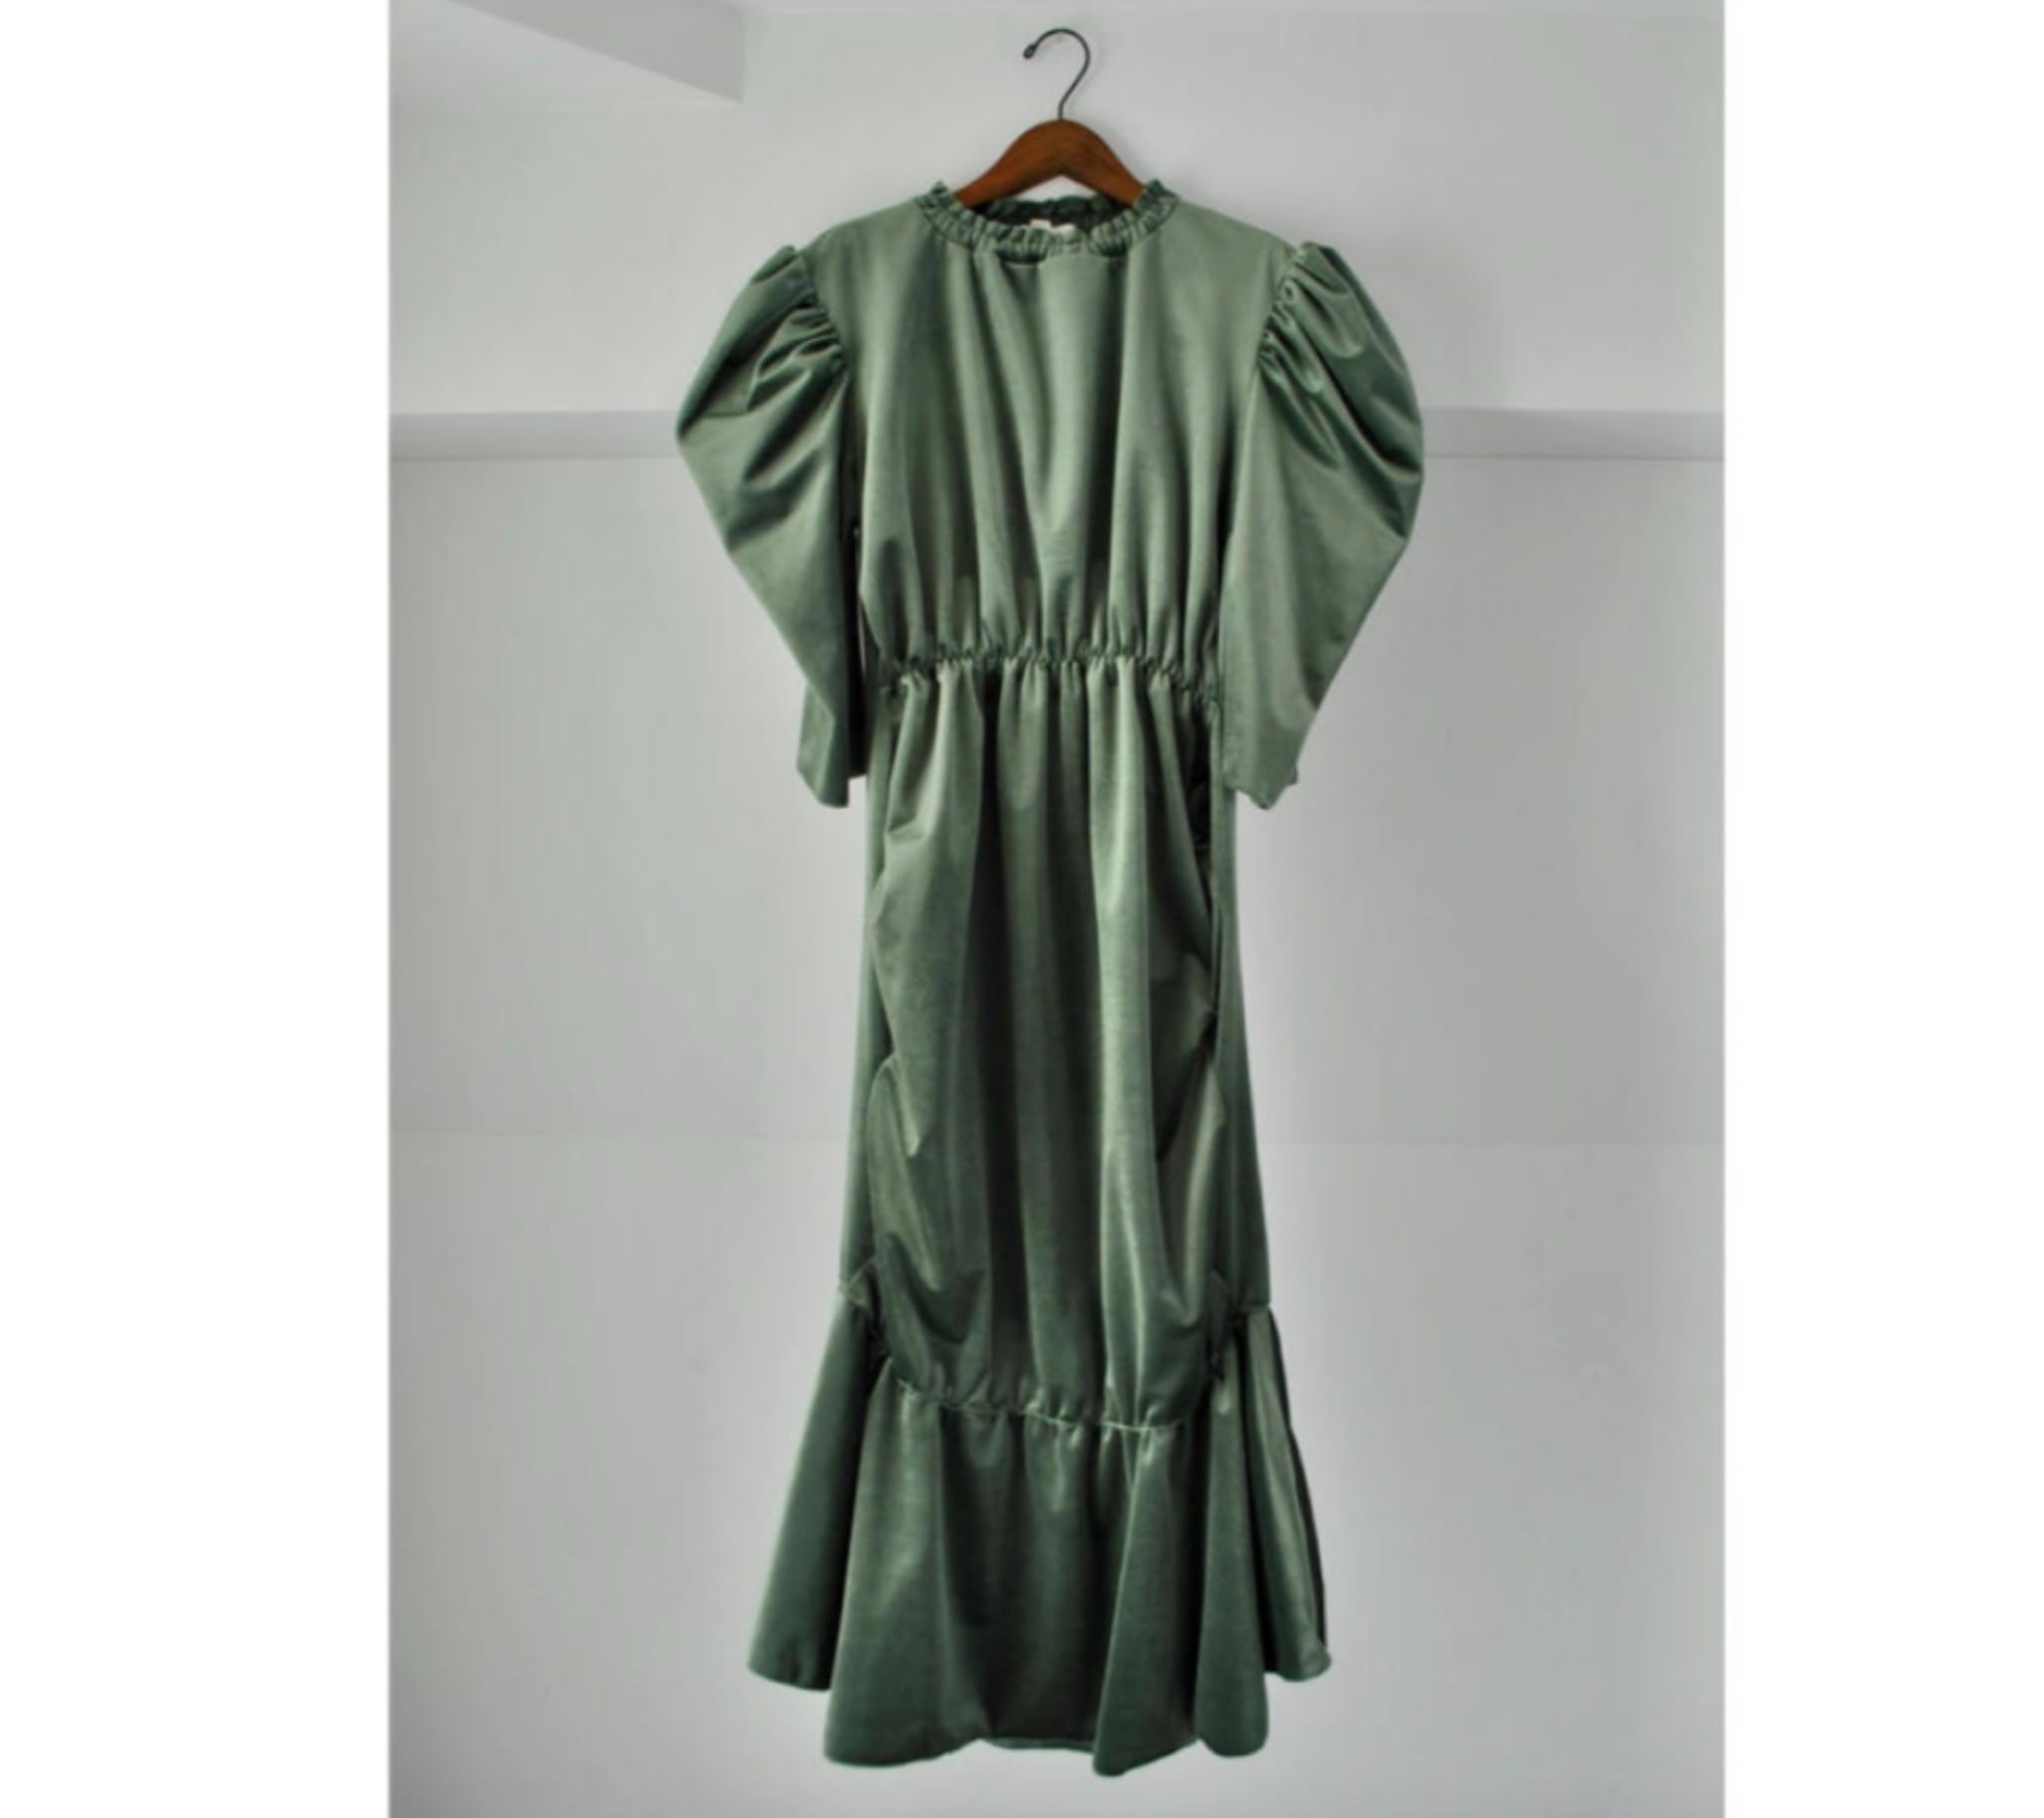 【 HOUGA 】ホウガ / blossom dress / green / partydress